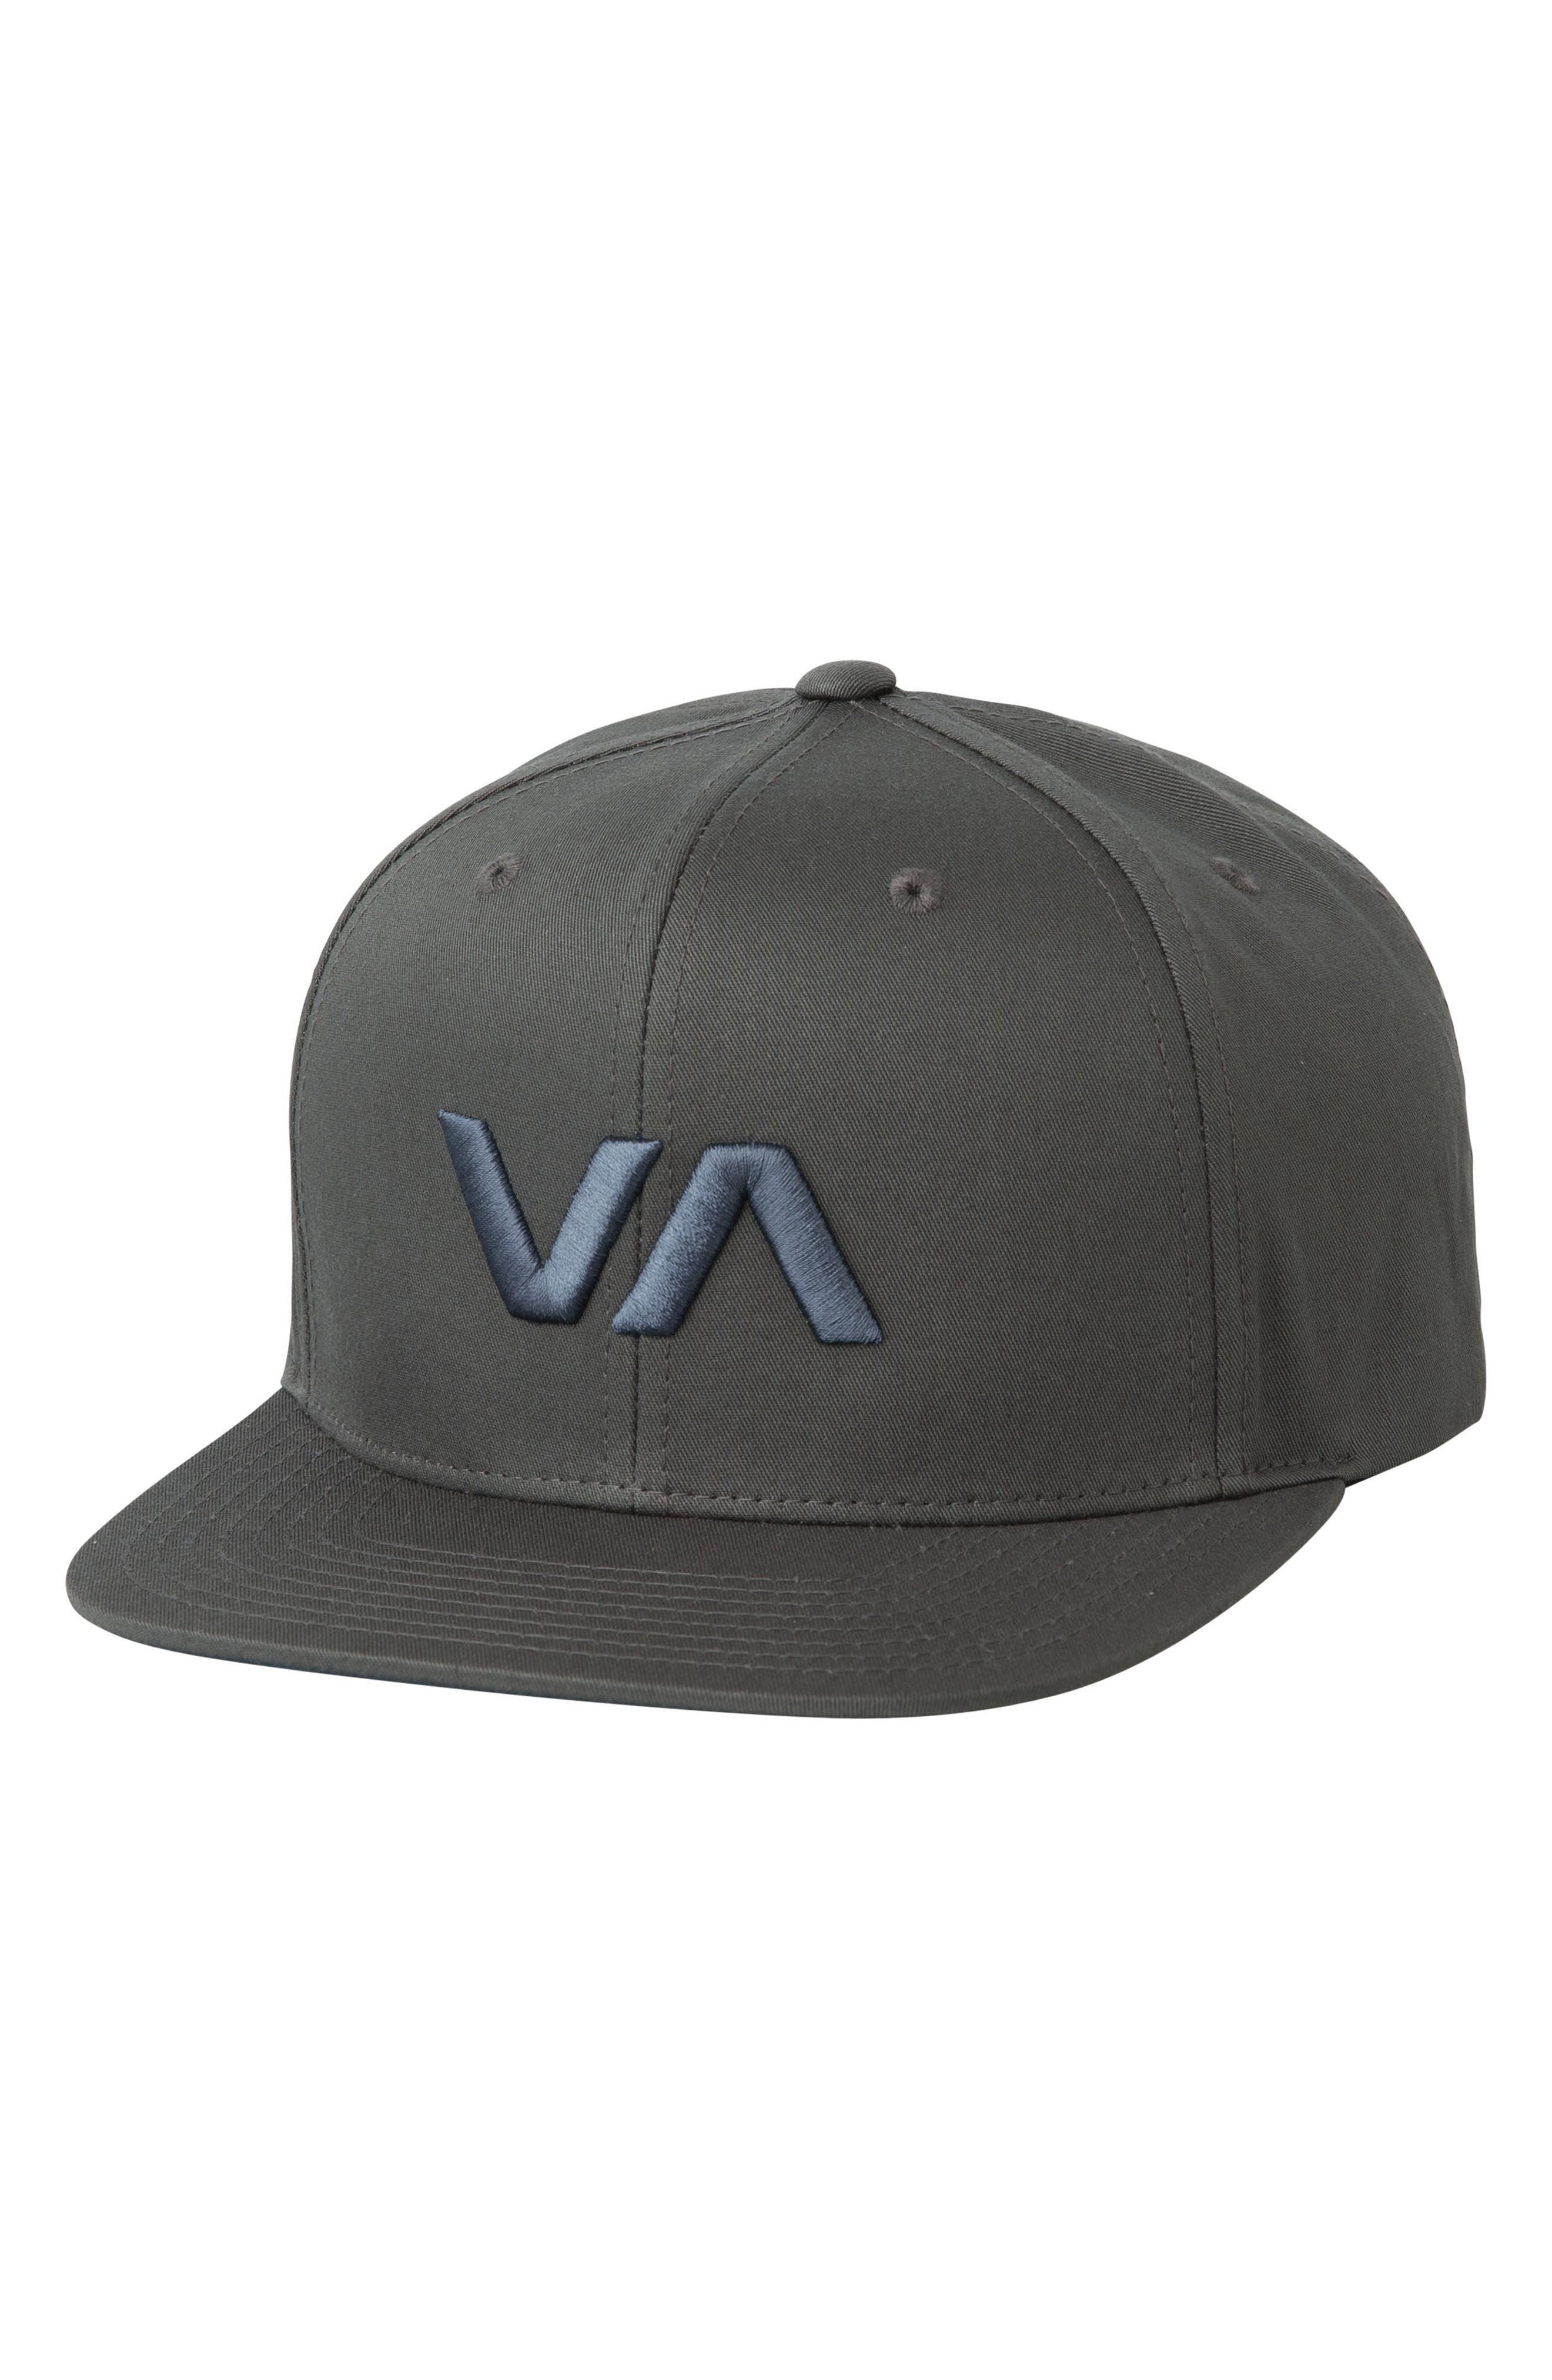 'VA' Snapback Hat,                         Main,                         color, 491